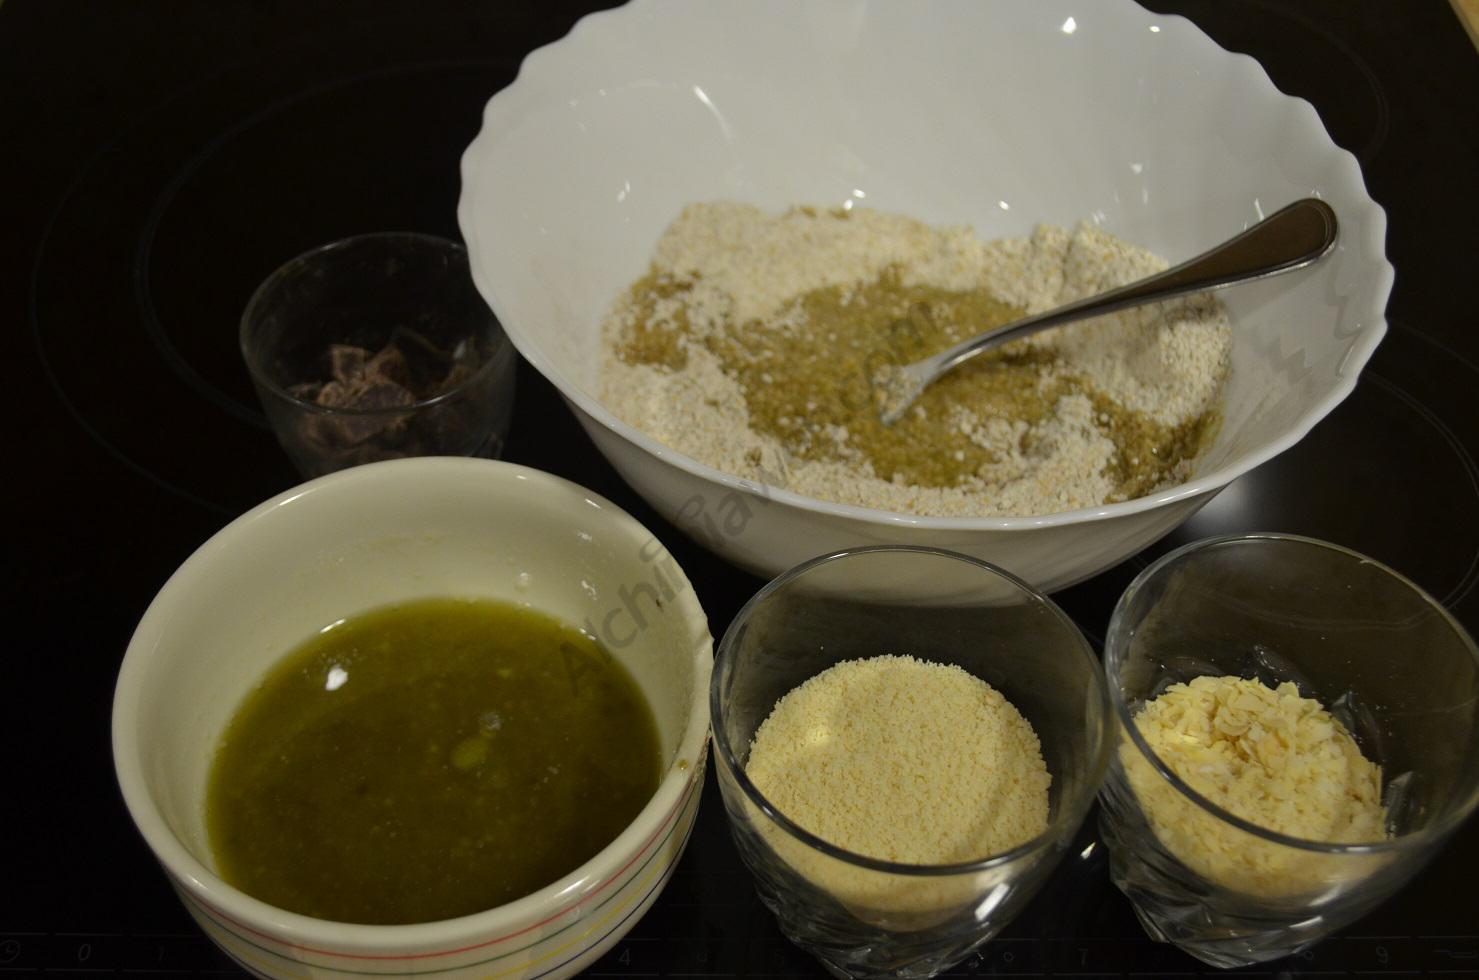 Vegan marijuana butter: cooking with coconut oil - Alchimia blog